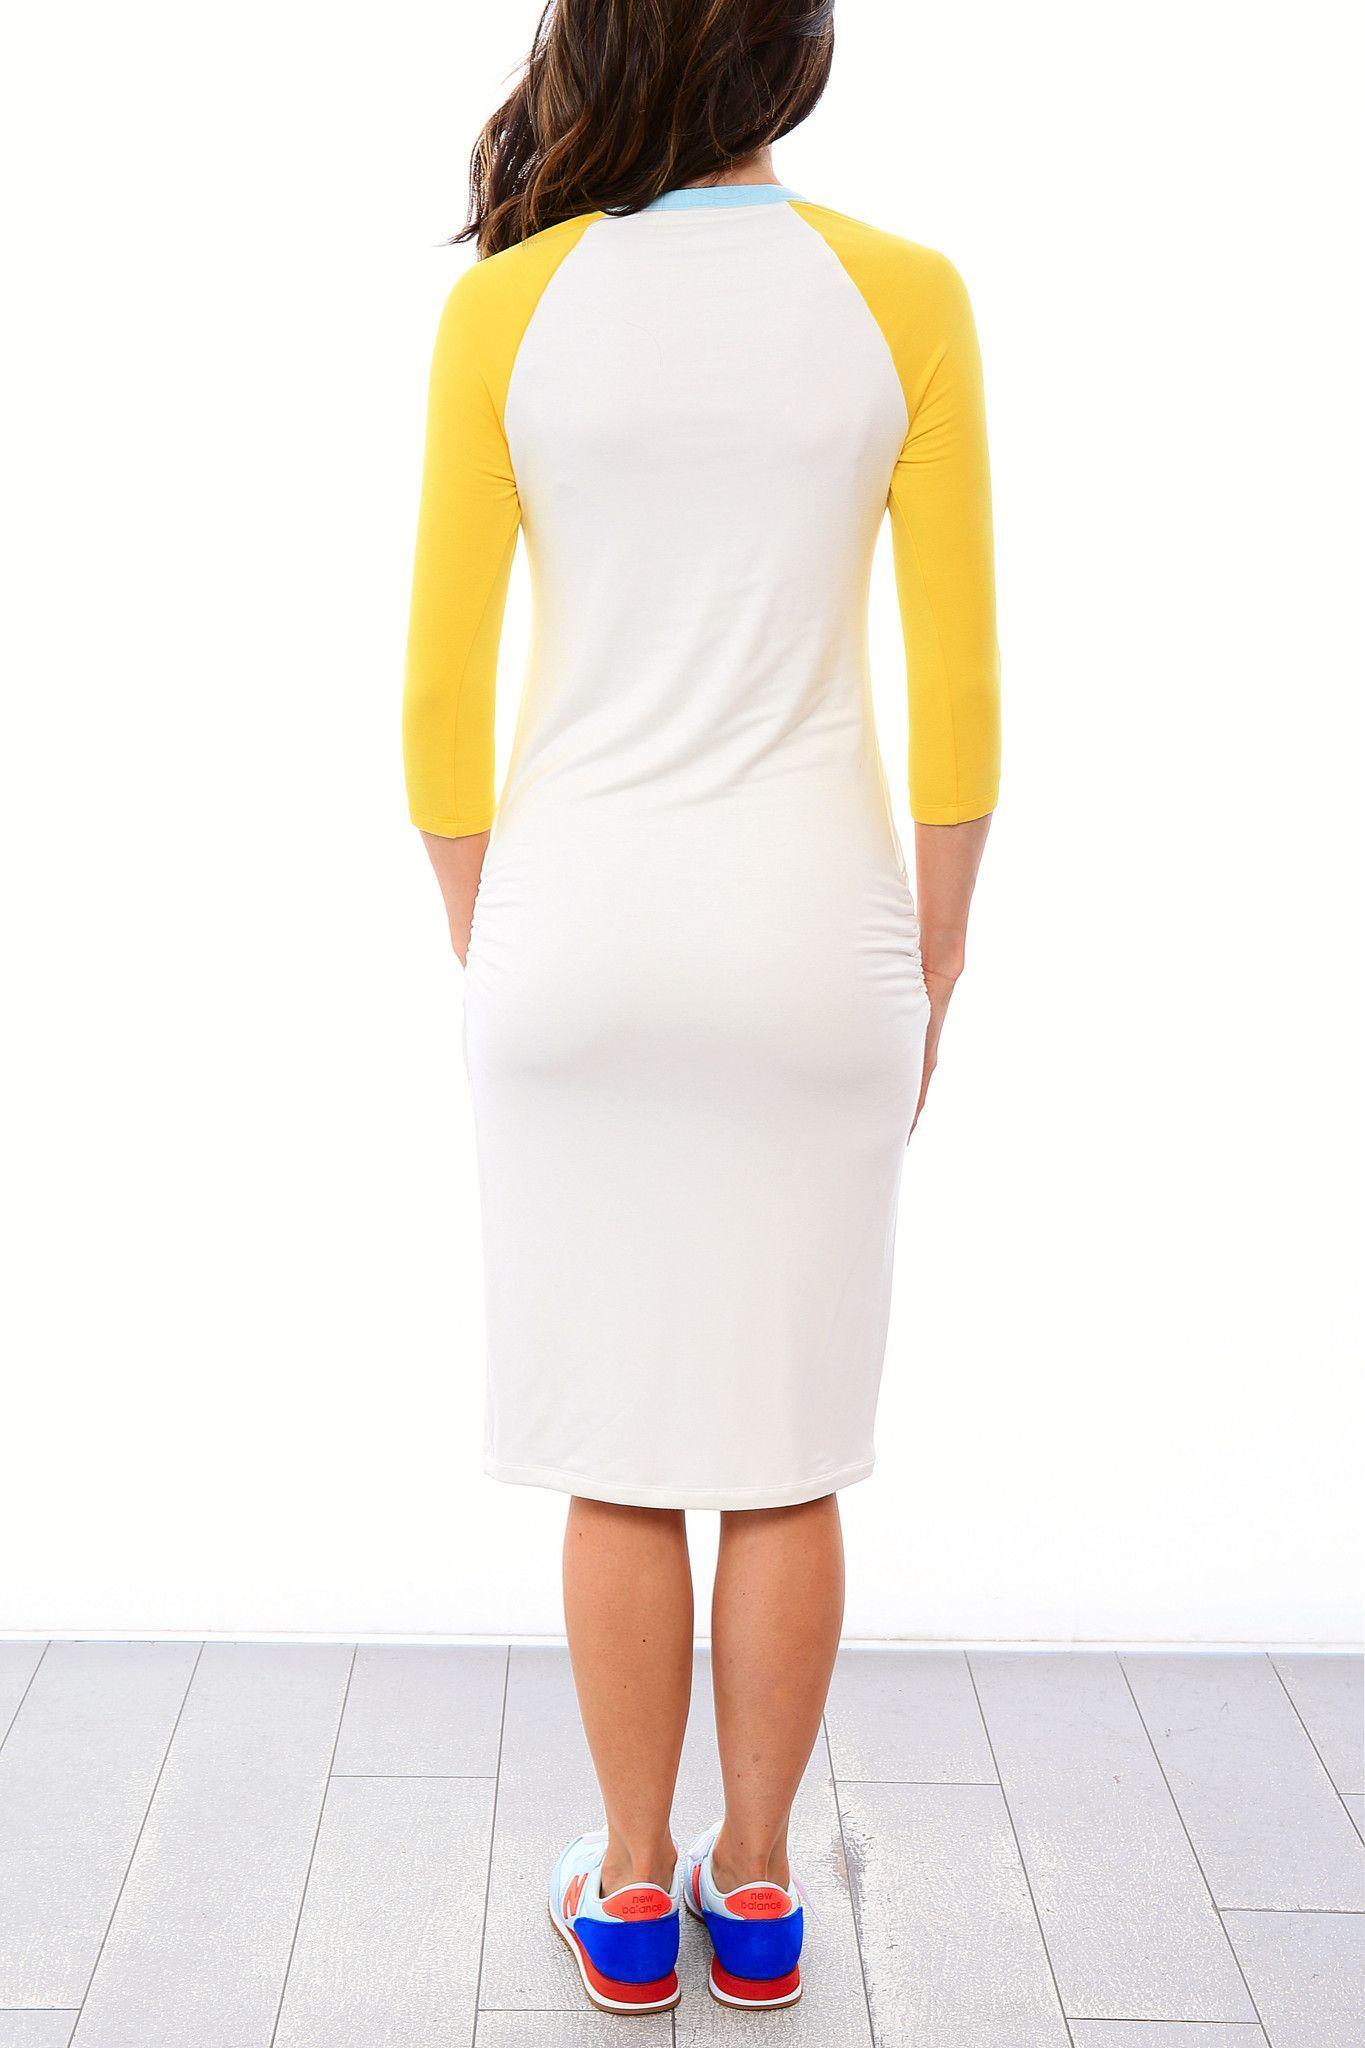 f7c6226b5d473 Raglan Sleeve Nursing Dress - White/Lemon/Blue Spa | Harper & Bay ...